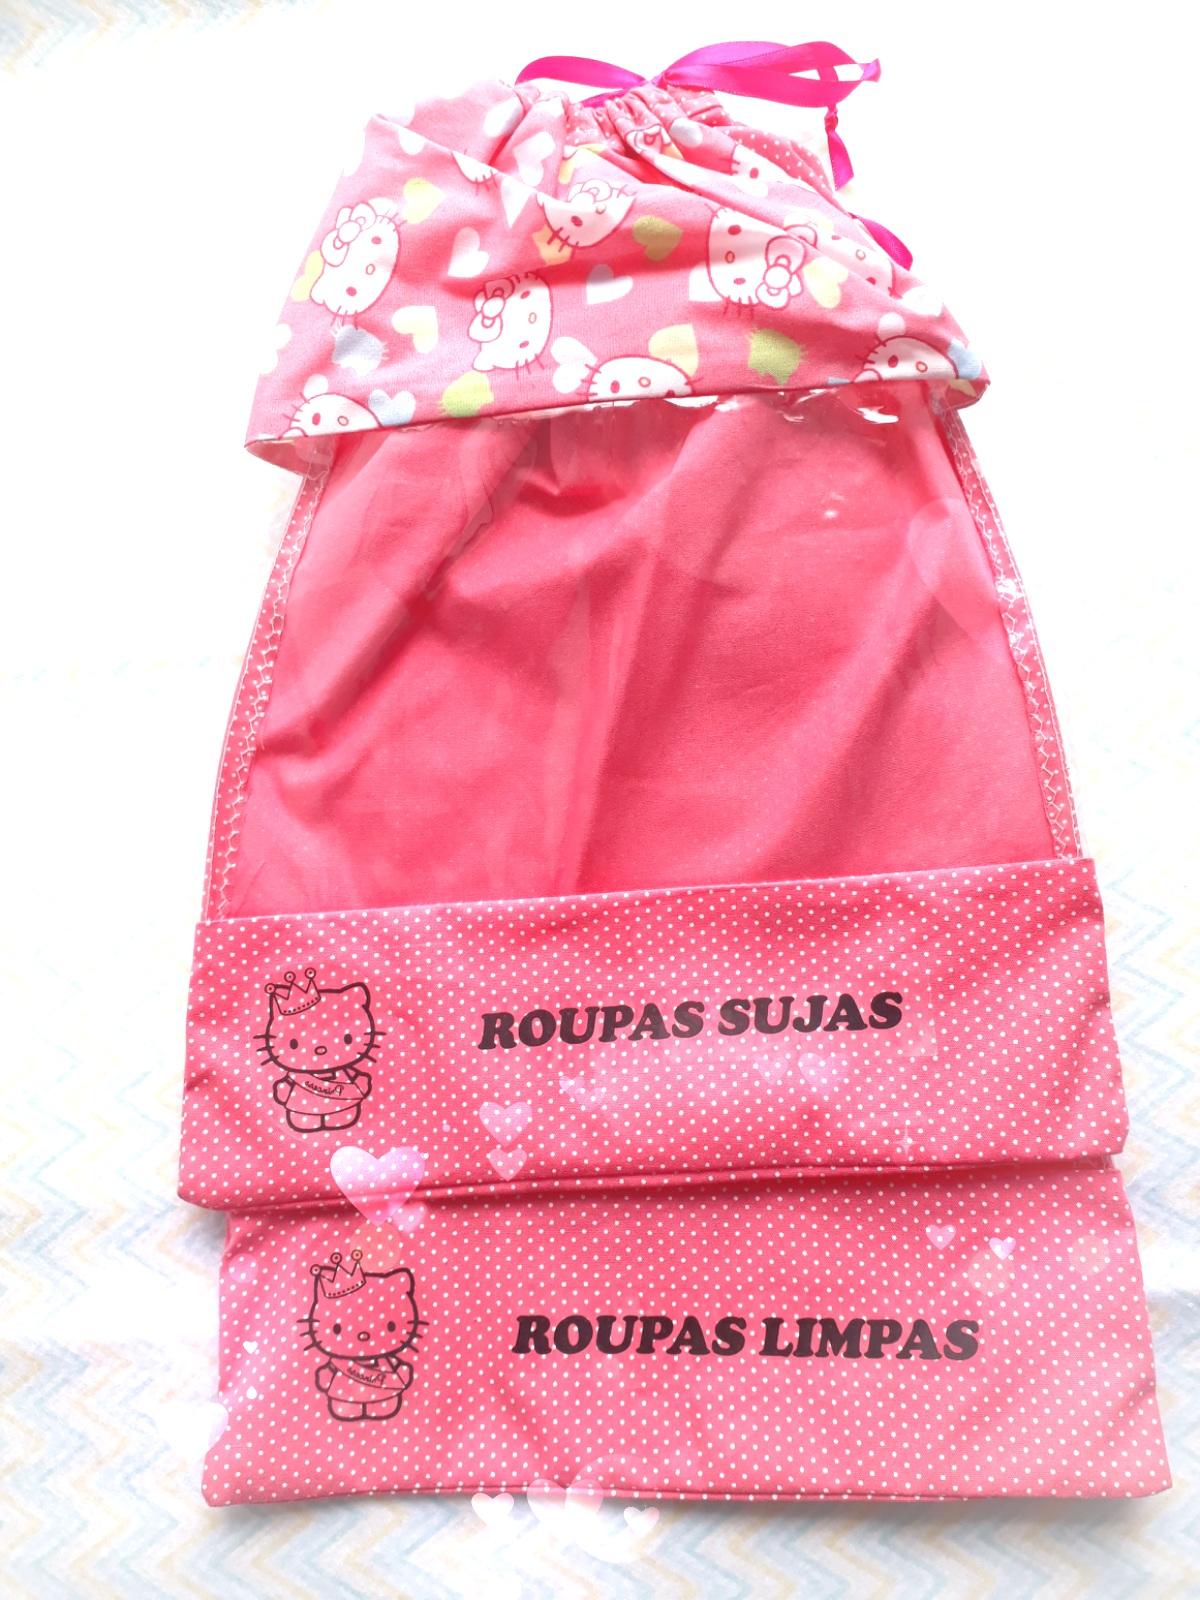 4e472e9fcd Kit Sacola Organizadora Roupa Limpa Roupa suja Hello Kitty 2 no Elo7 ...